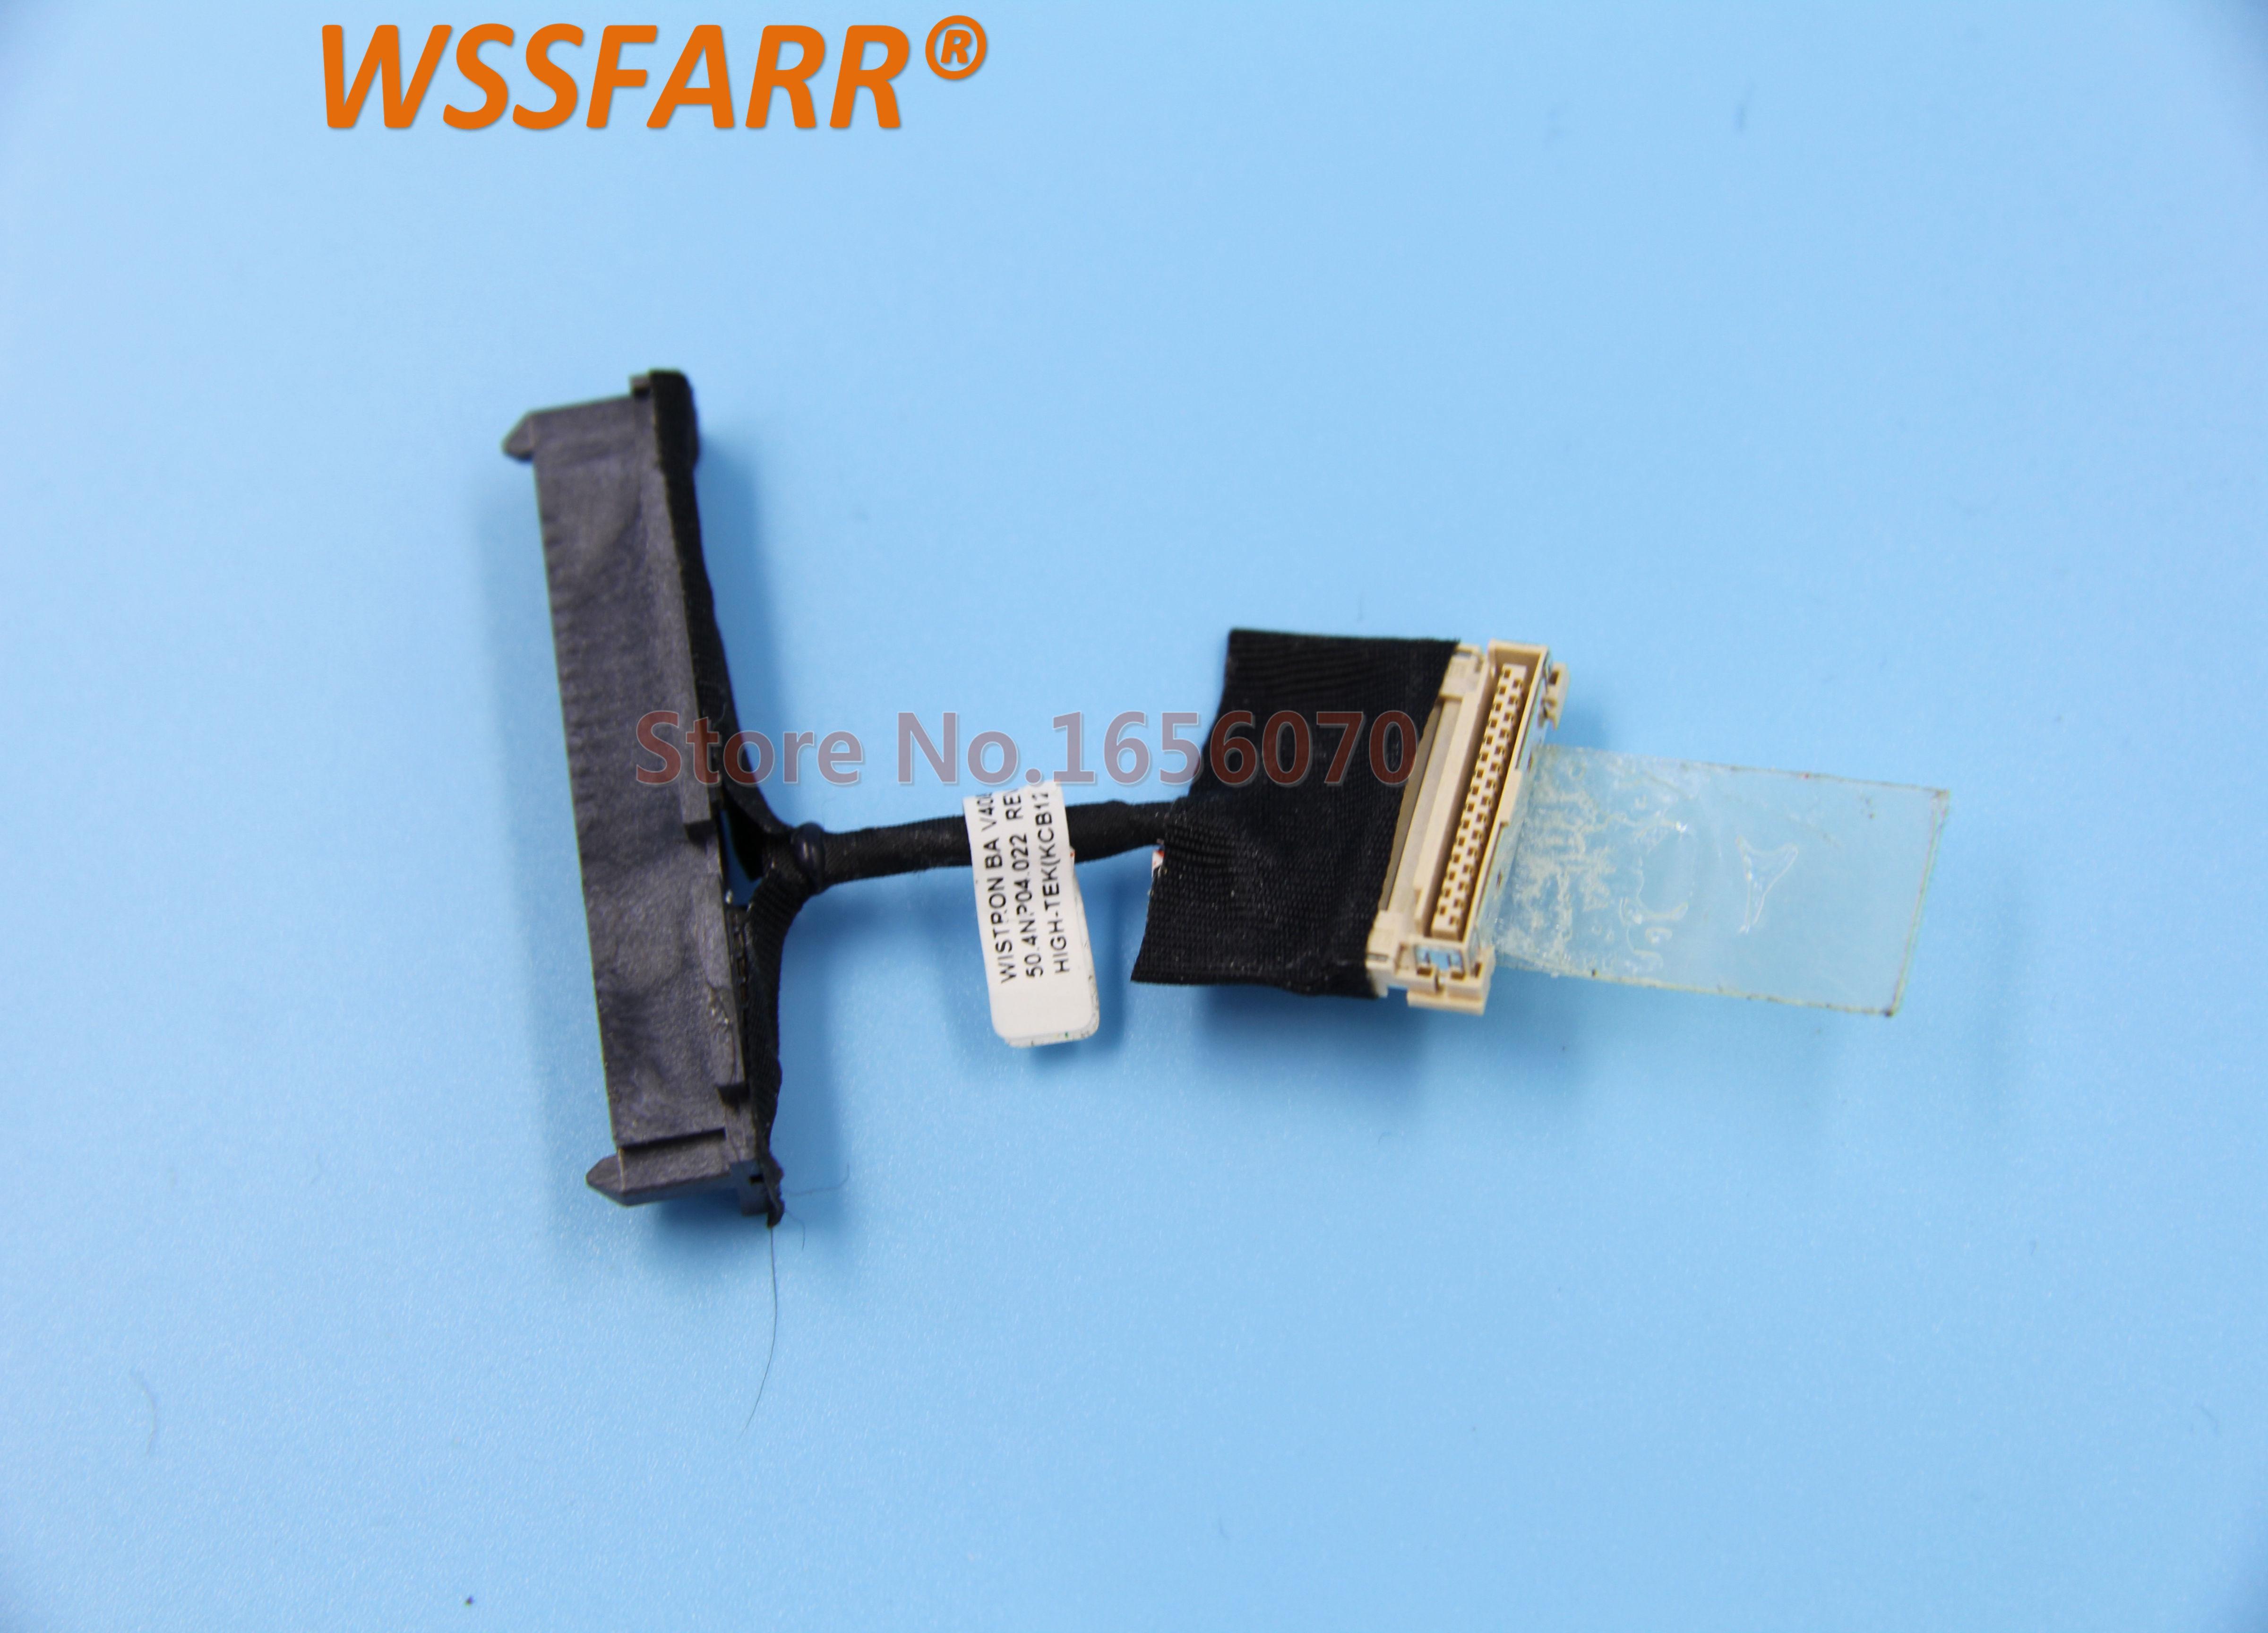 Ordenador portátil HDD Cable para ACER 8573 de 8573 de la serie T de 8573TG 6595T 50.4NP04.022 SATA HDD Disco Duro cable conector a prueba bien.